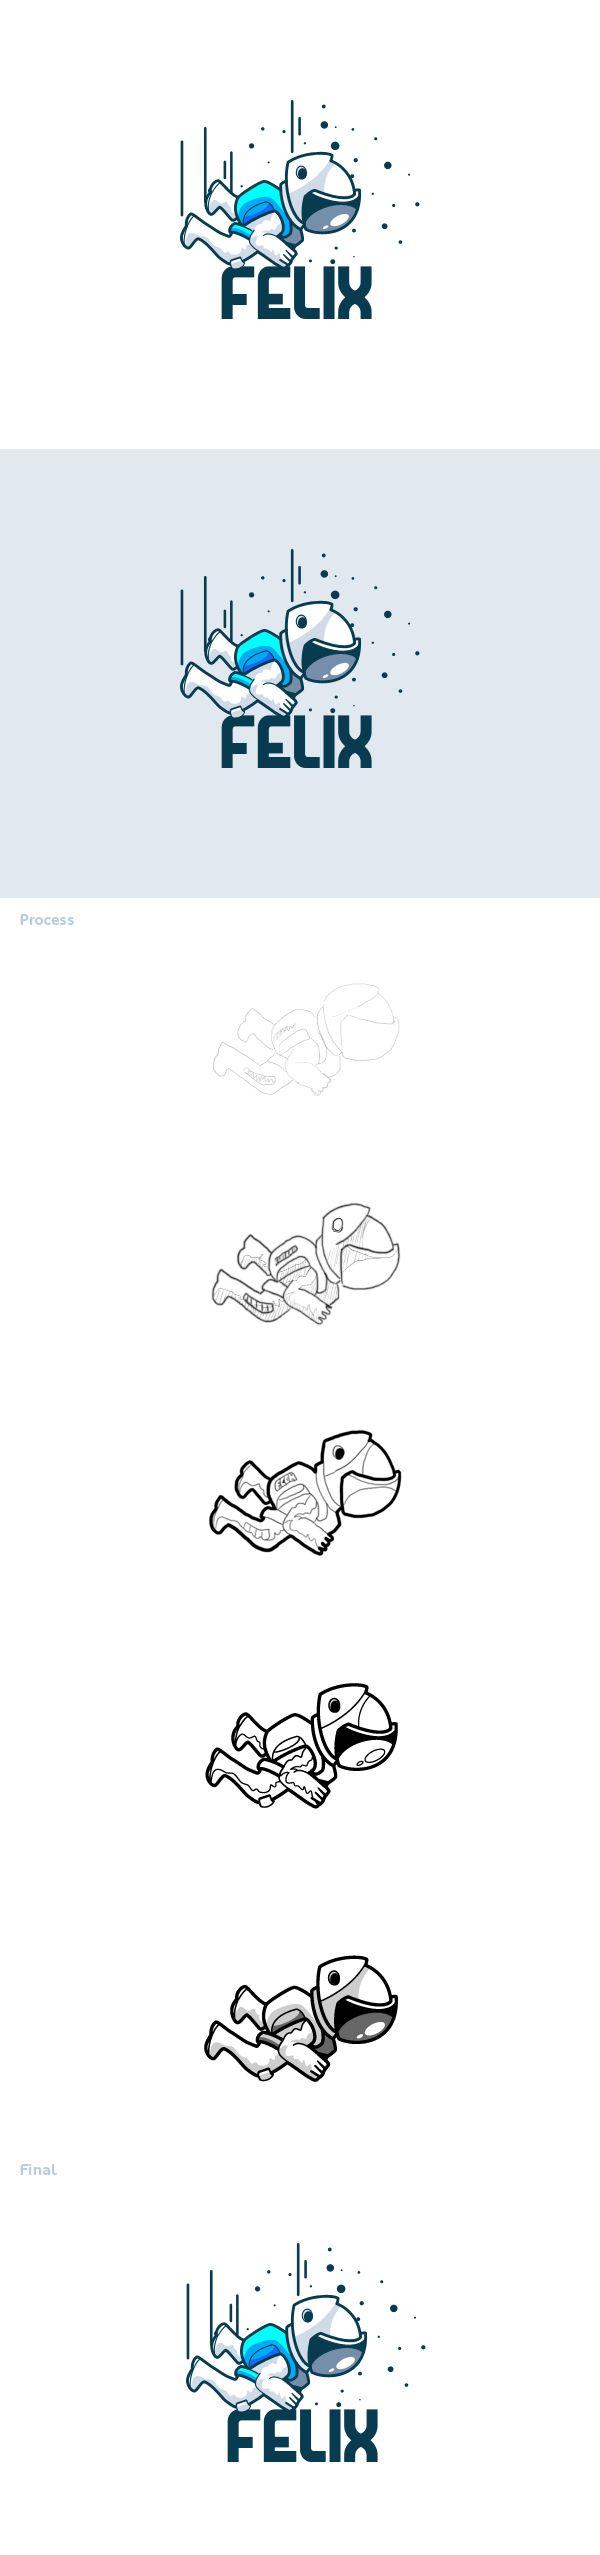 Felix #identity #graphisme #design #logo